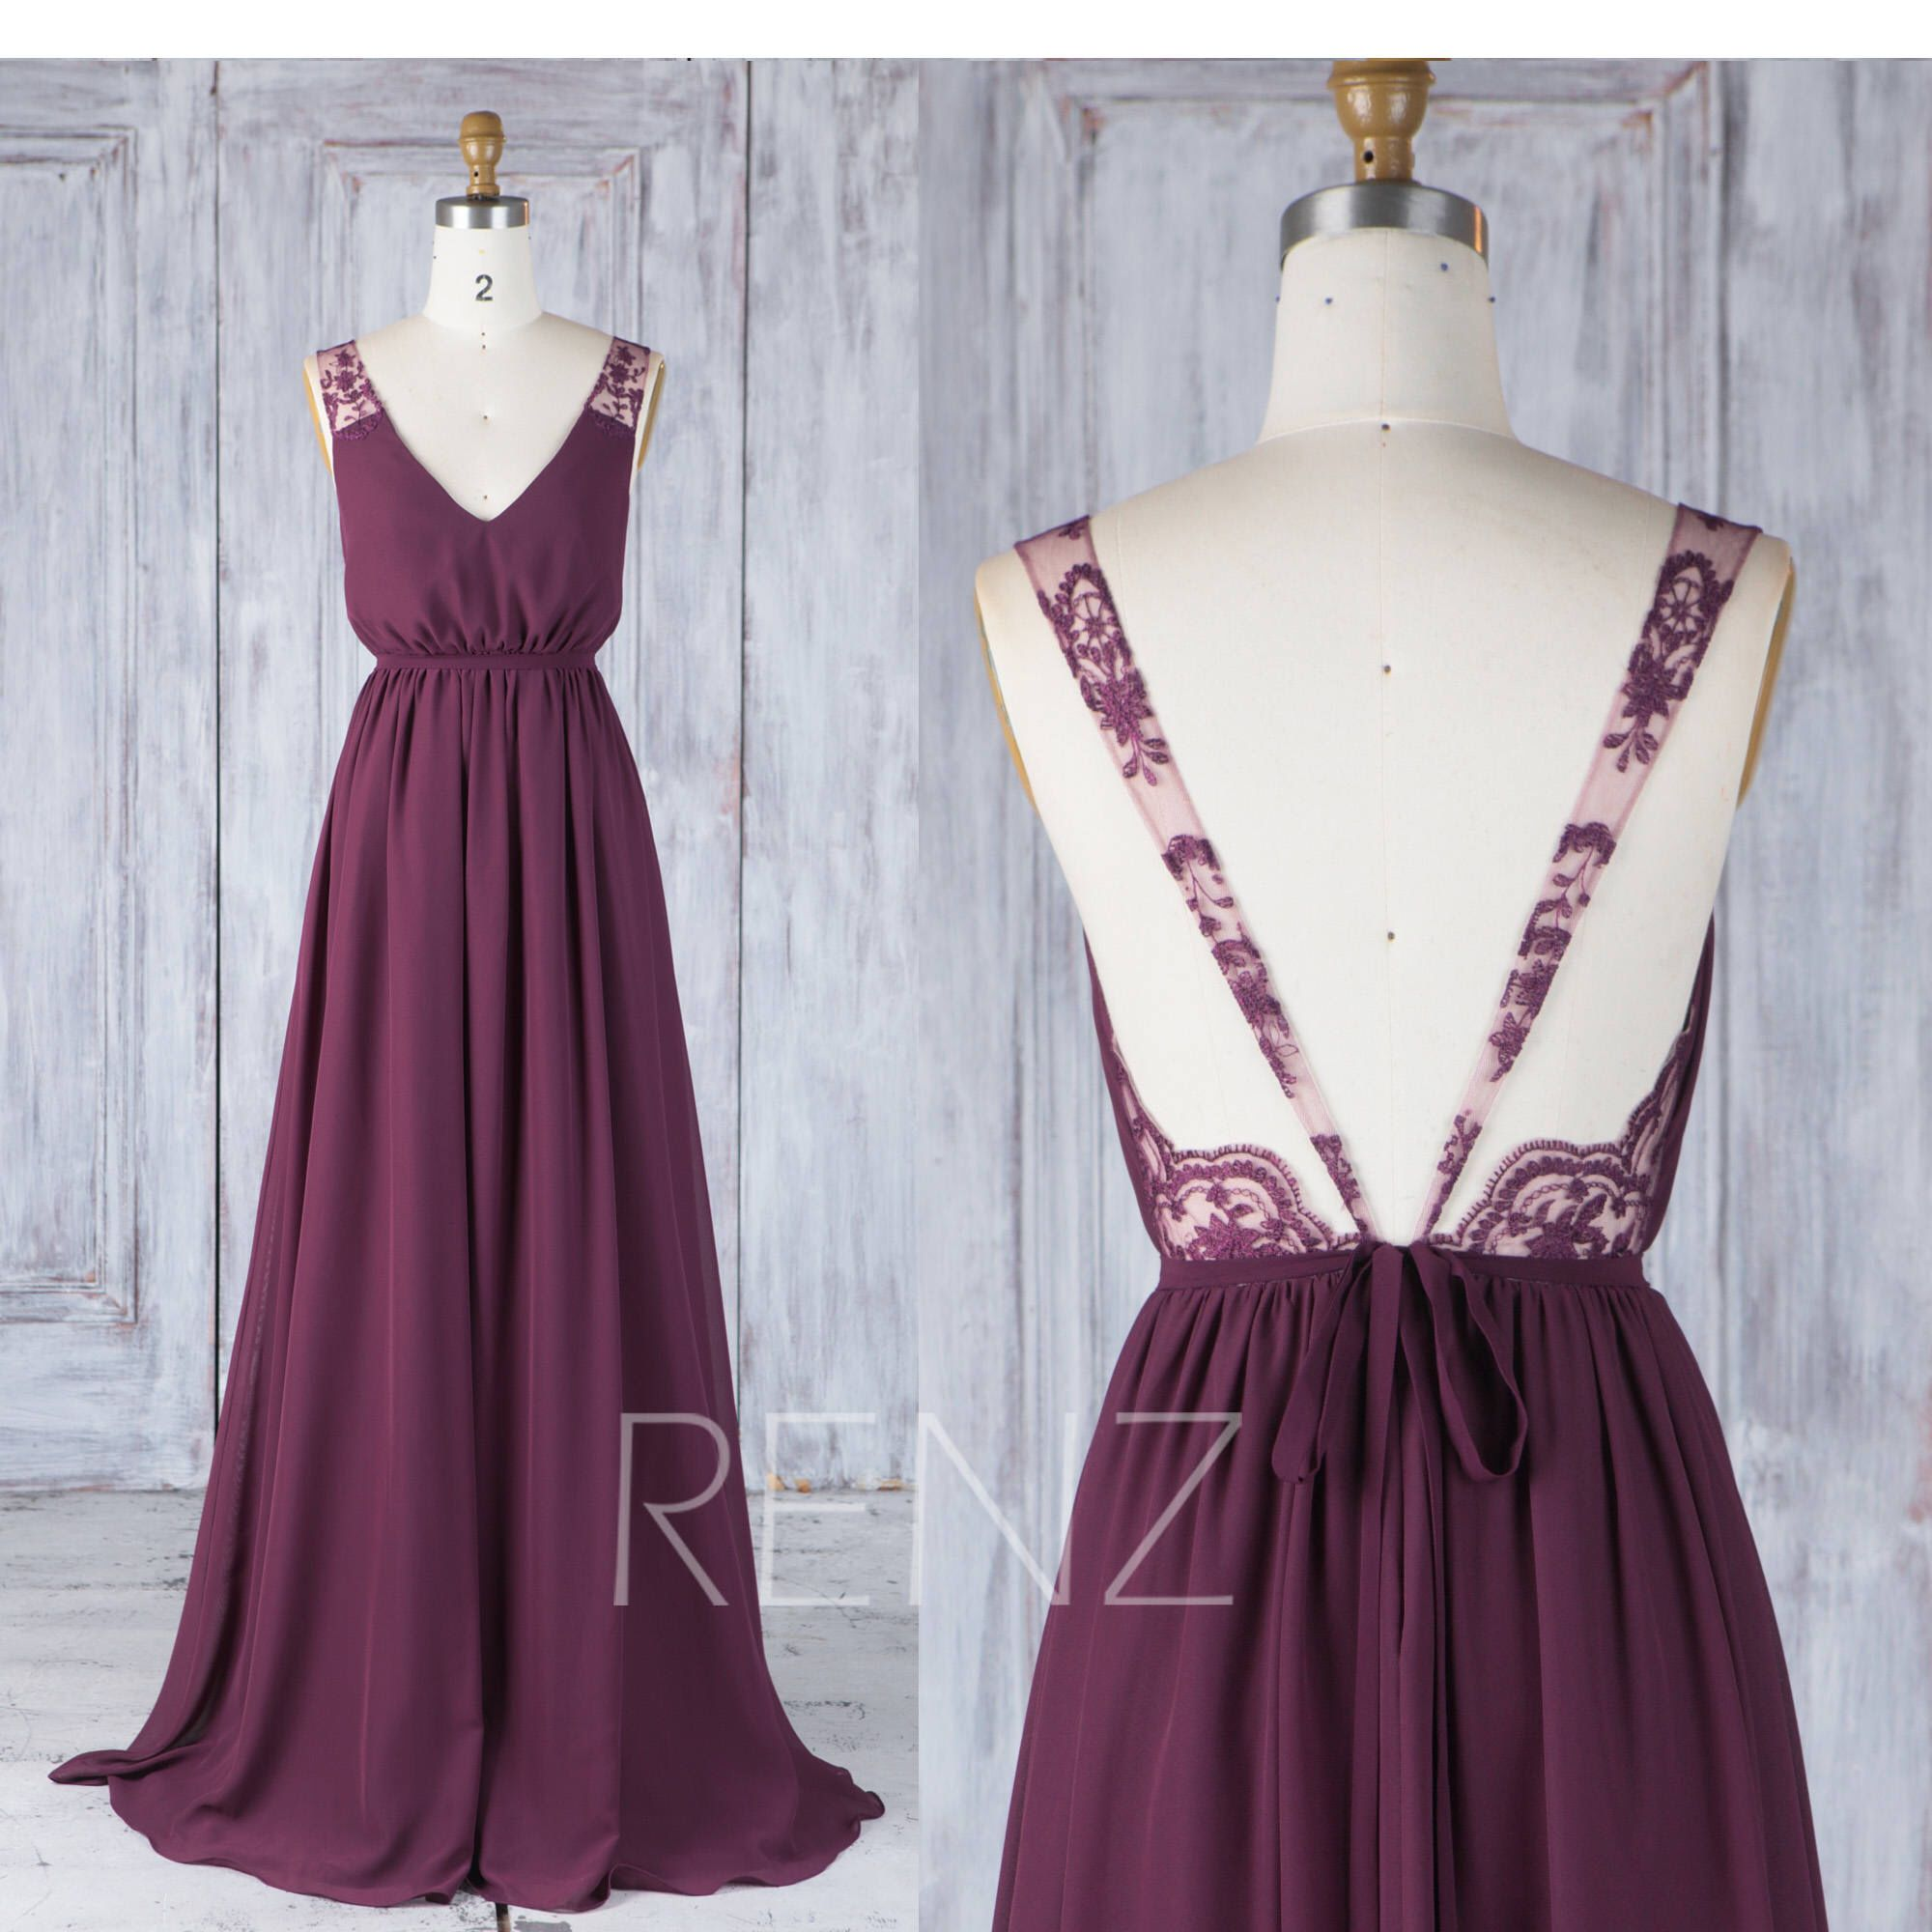 Bridesmaid Dress Plum Chiffon Wedding Dress with Sash,V Neck Prom ...